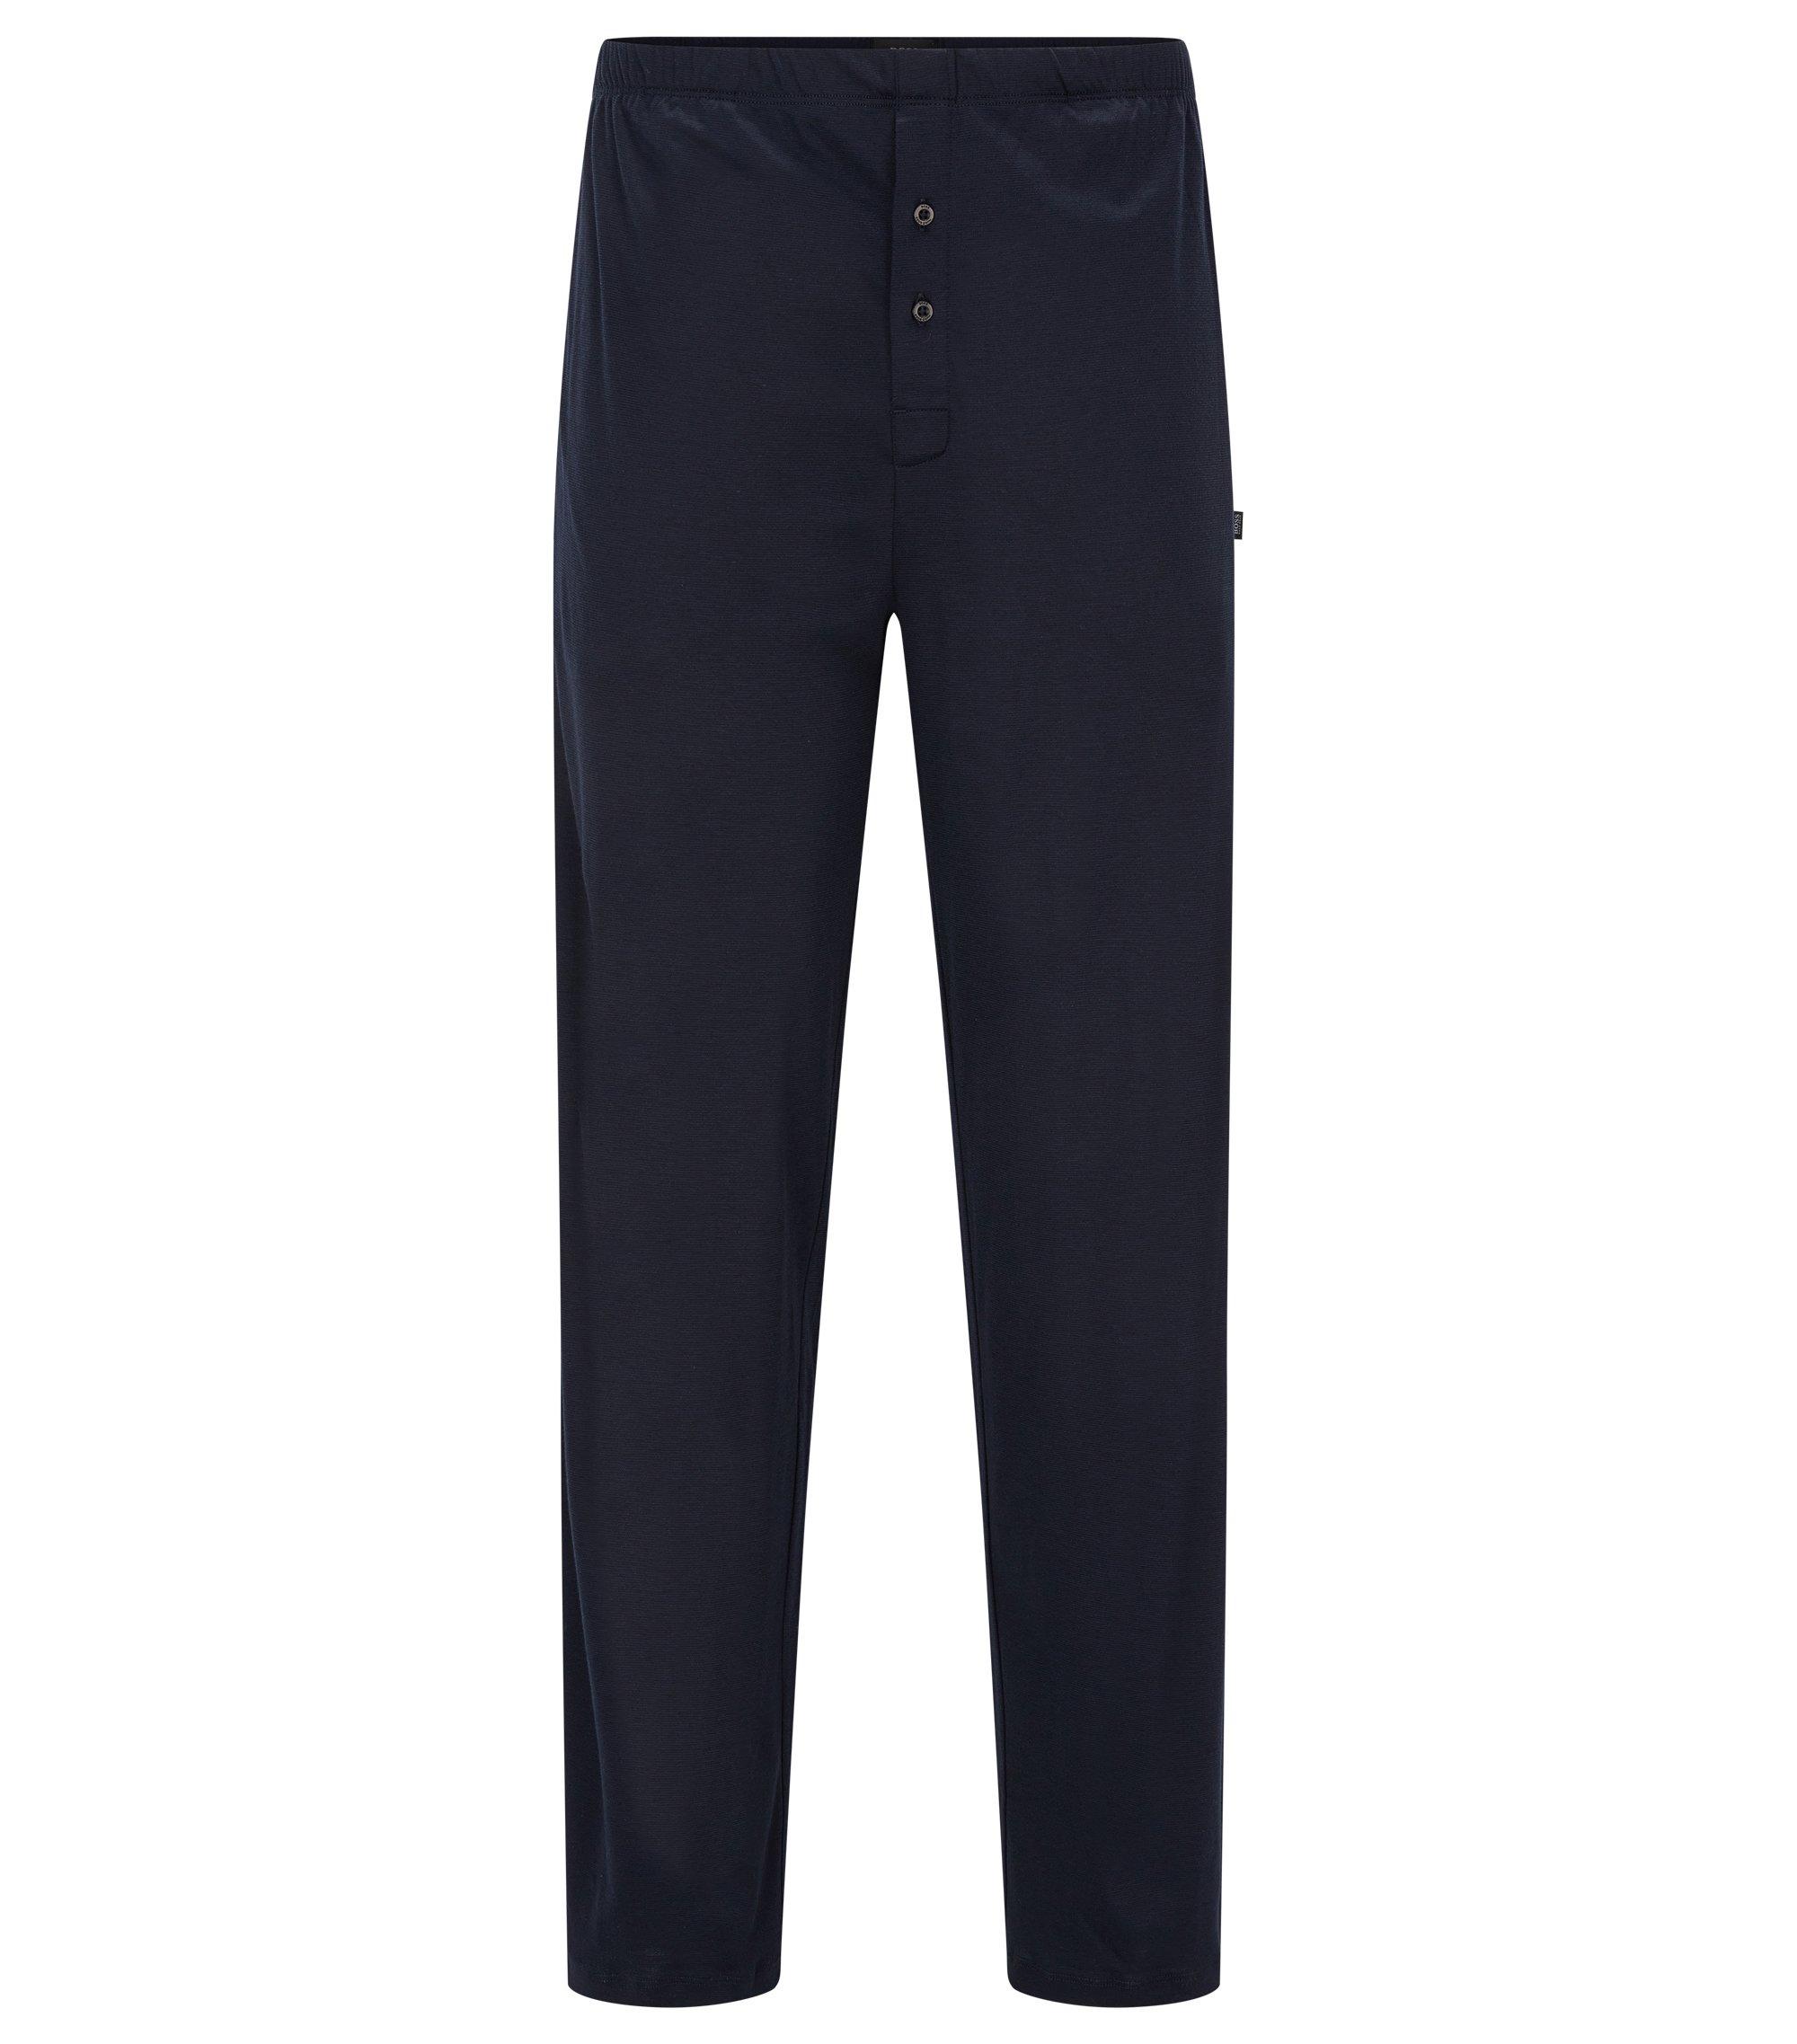 Pantalón de pijama en algodón y modal, Azul oscuro